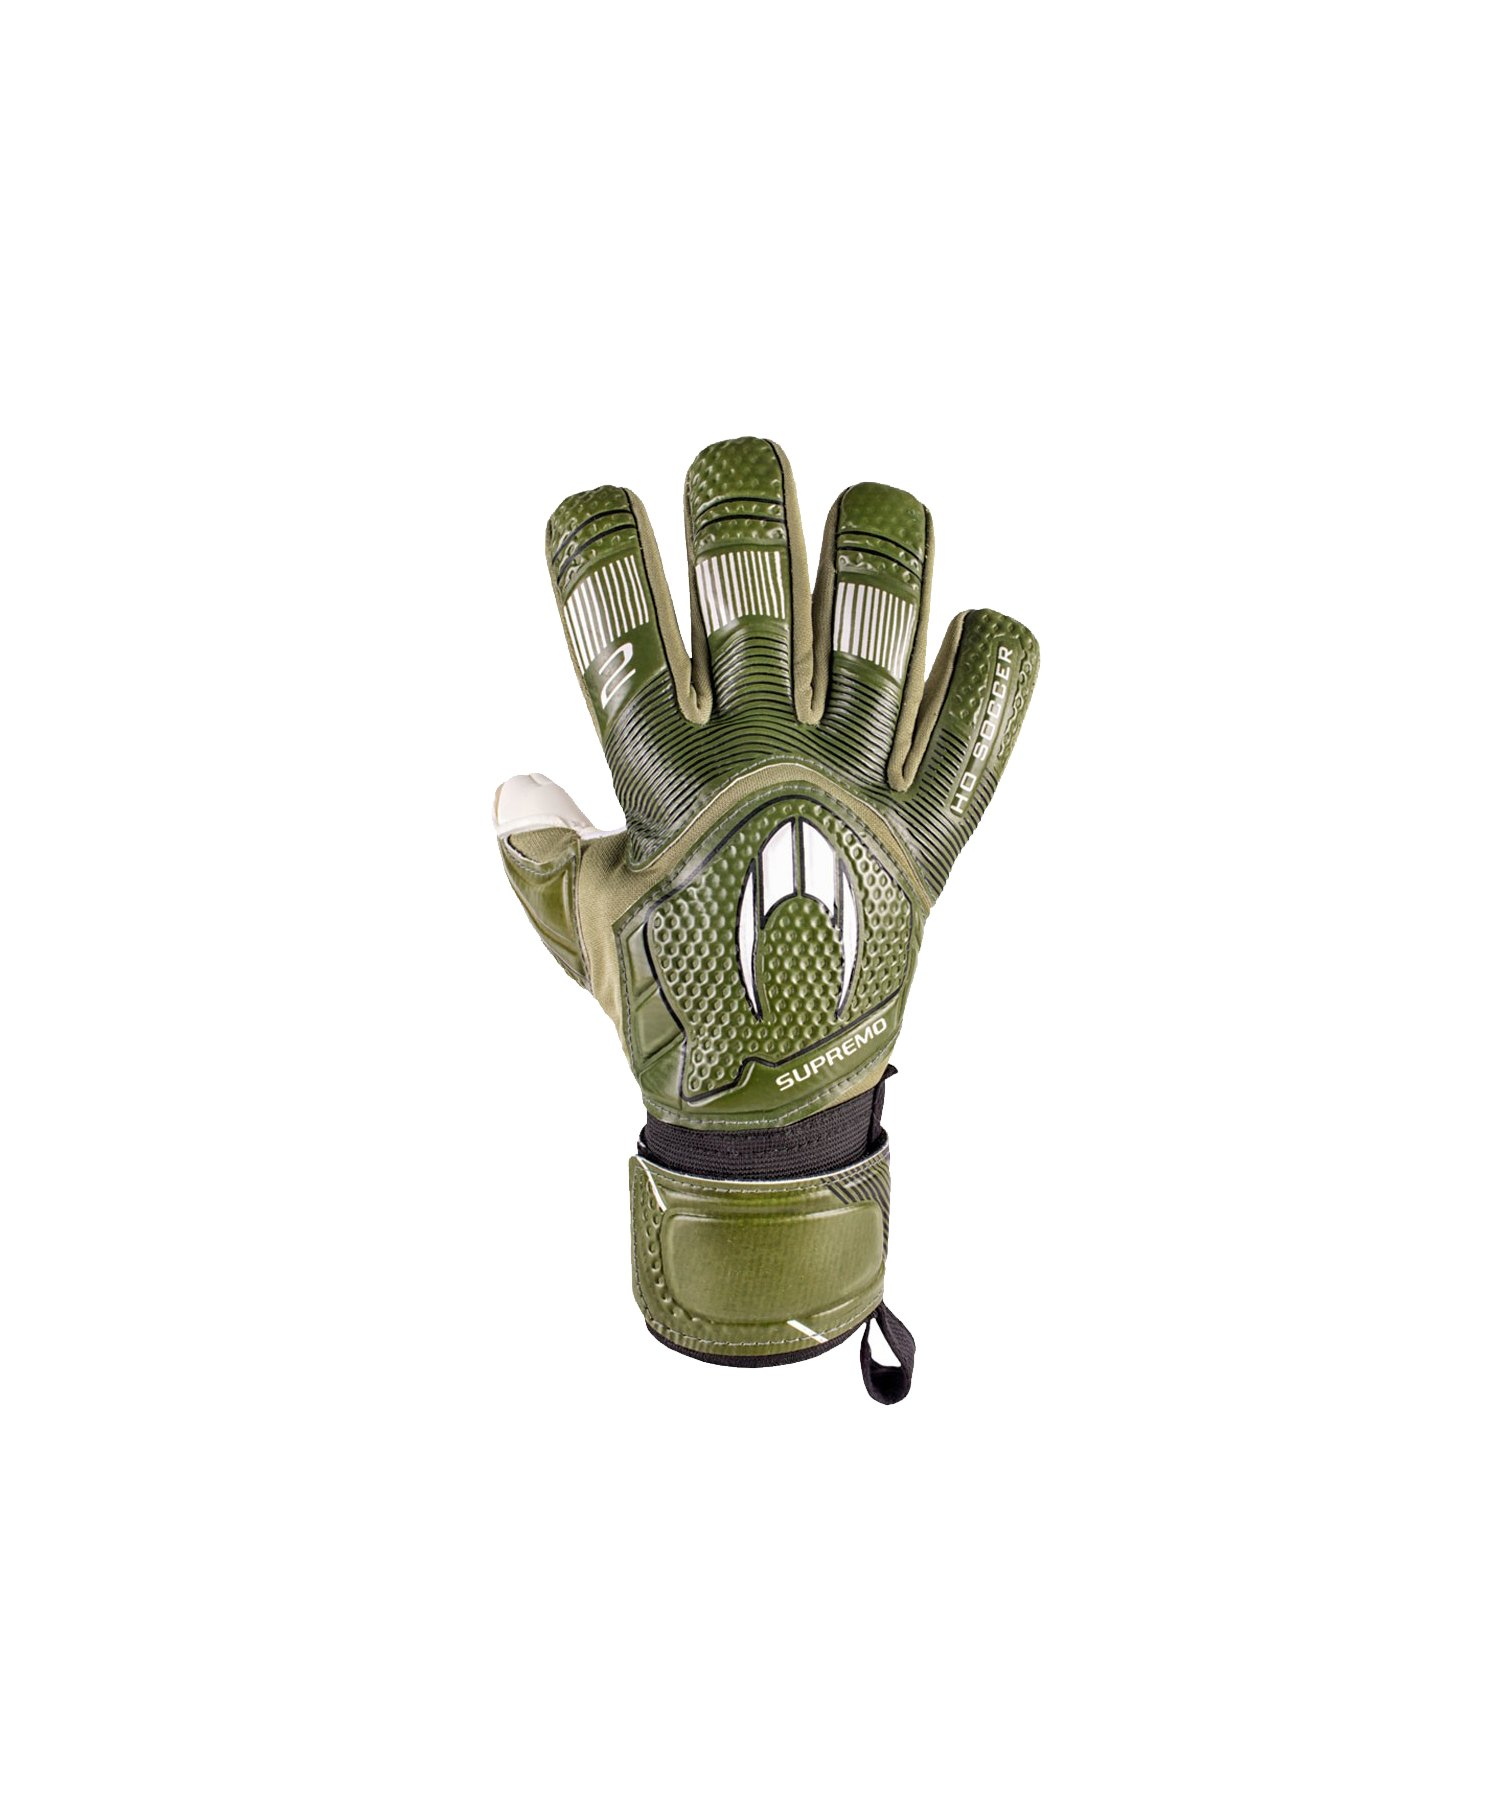 HO Soccer Clone Supremo II N TW-Handschuhe Grün - gruen